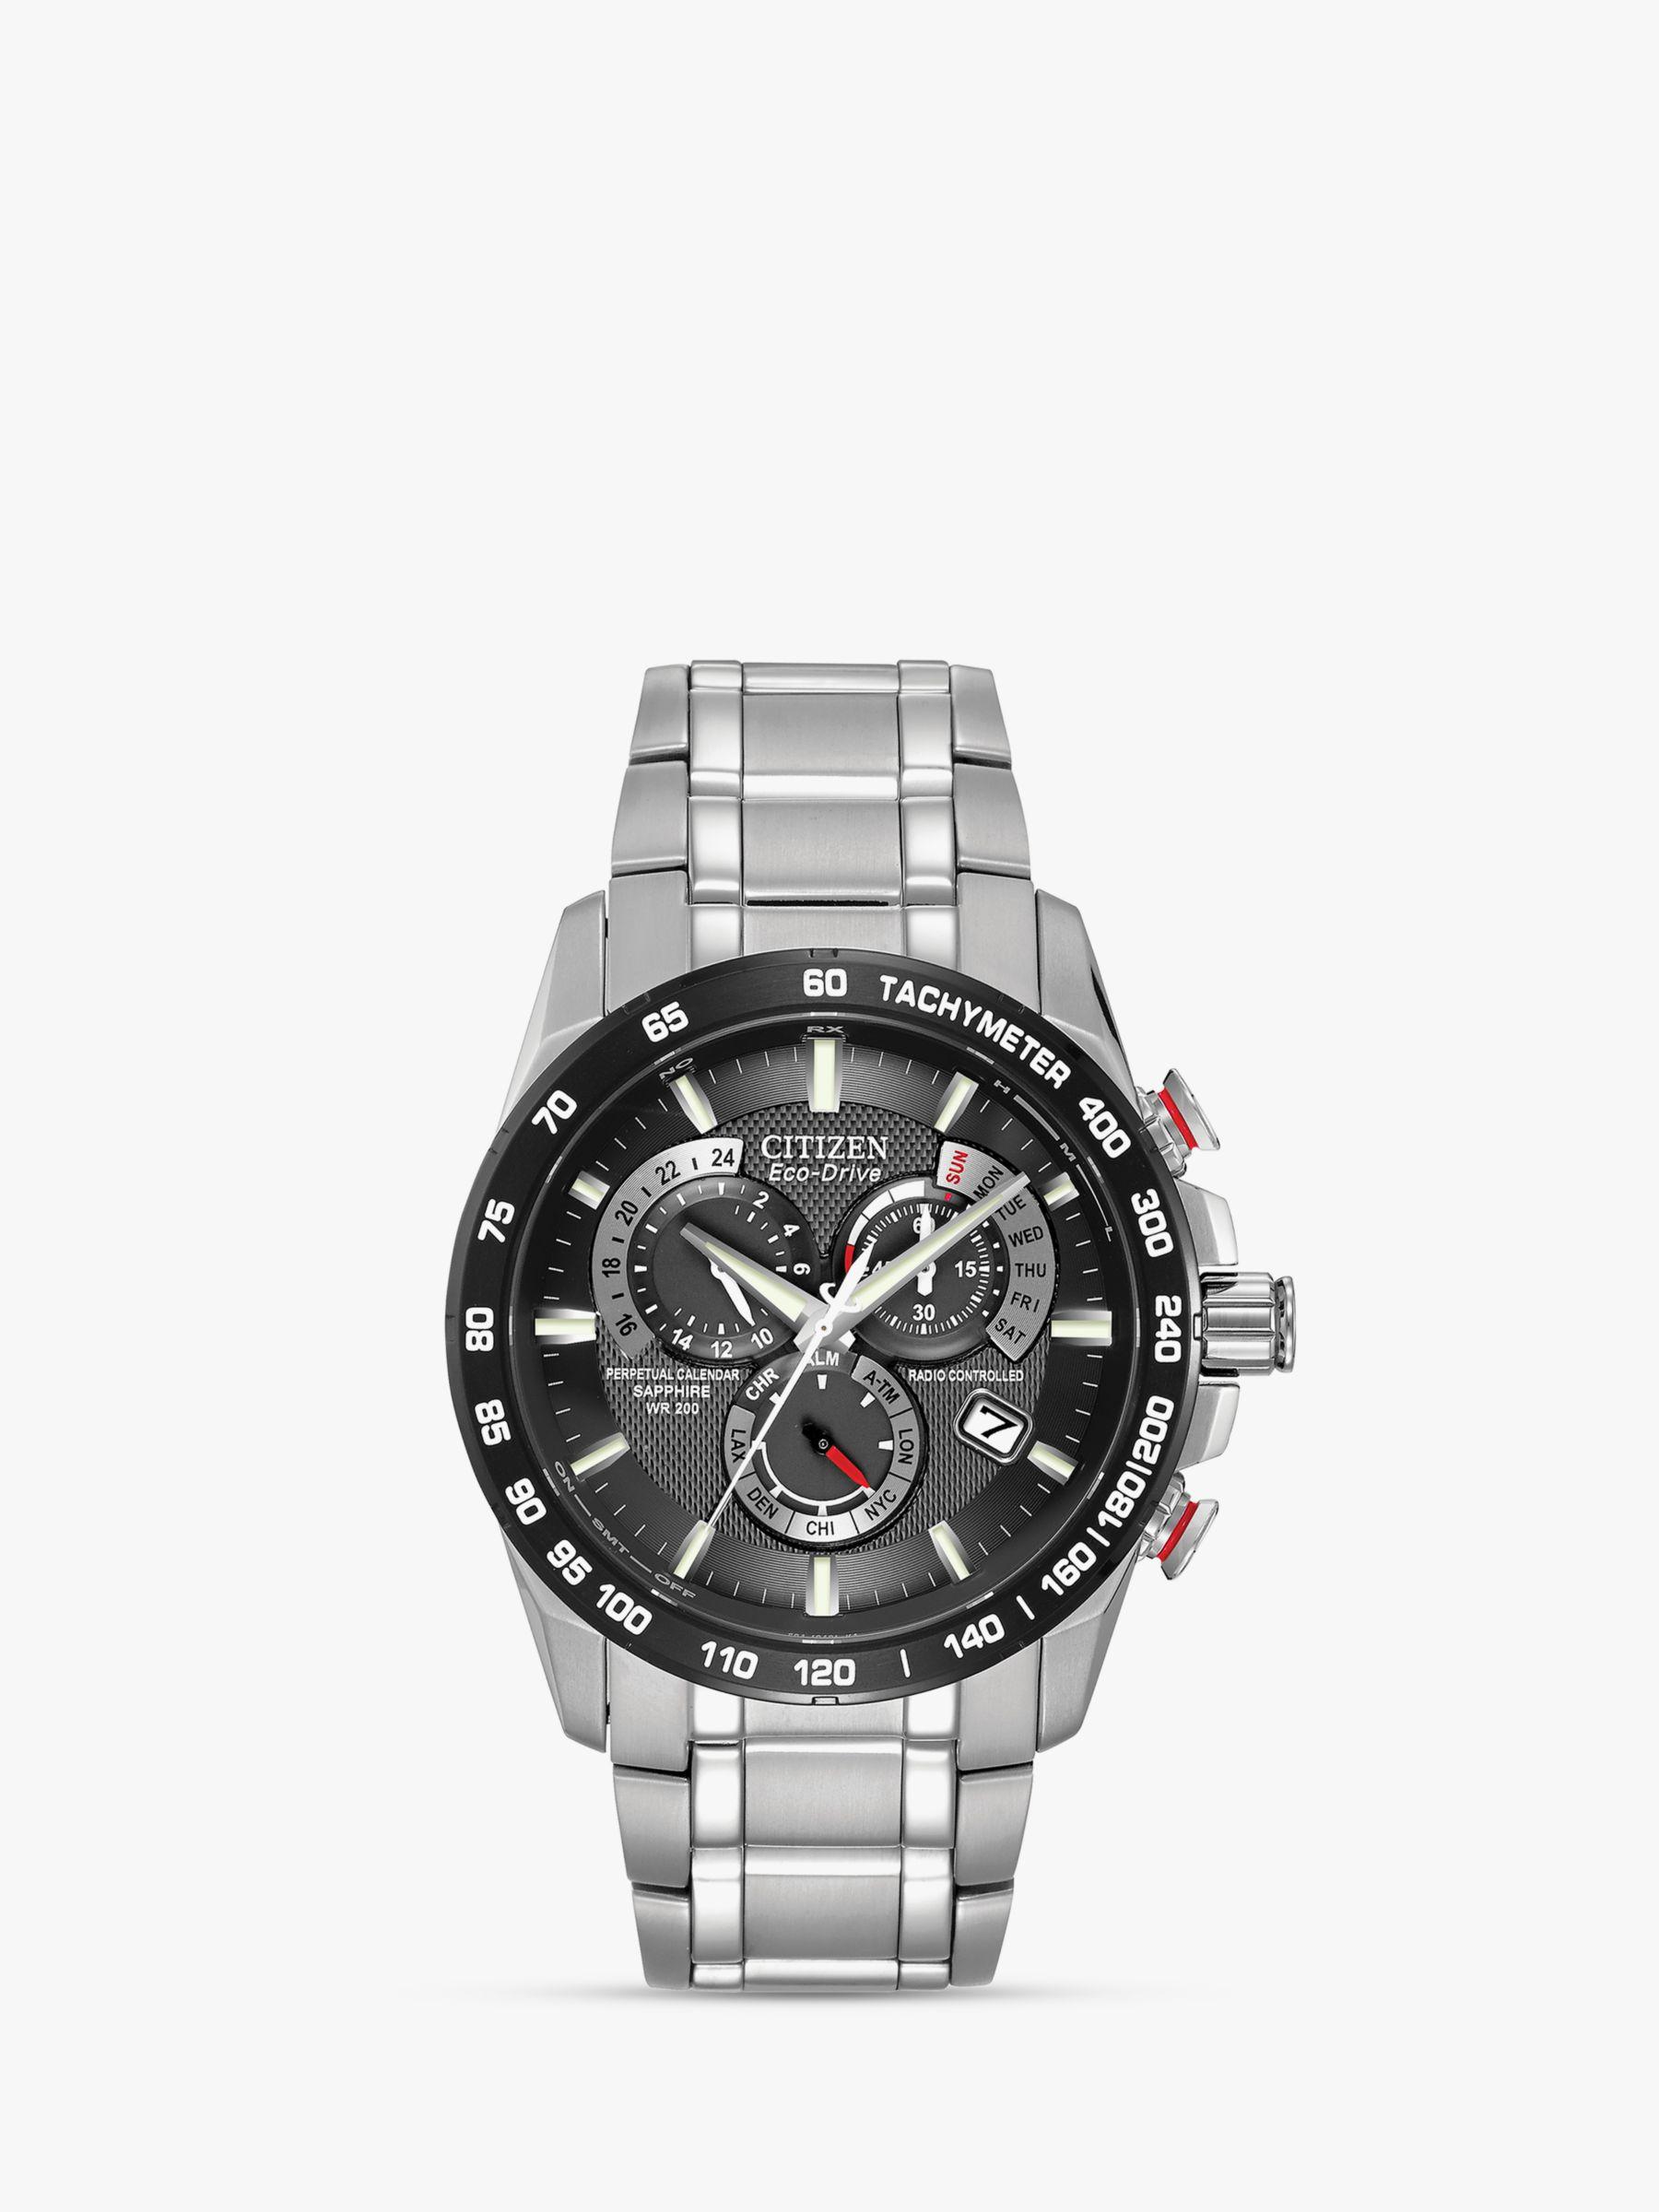 a1e4aefbcfd0a Citizen AT4008-51E Men s Eco-Drive Perpetual Calendar Chronograph Bracelet  Strap Watch